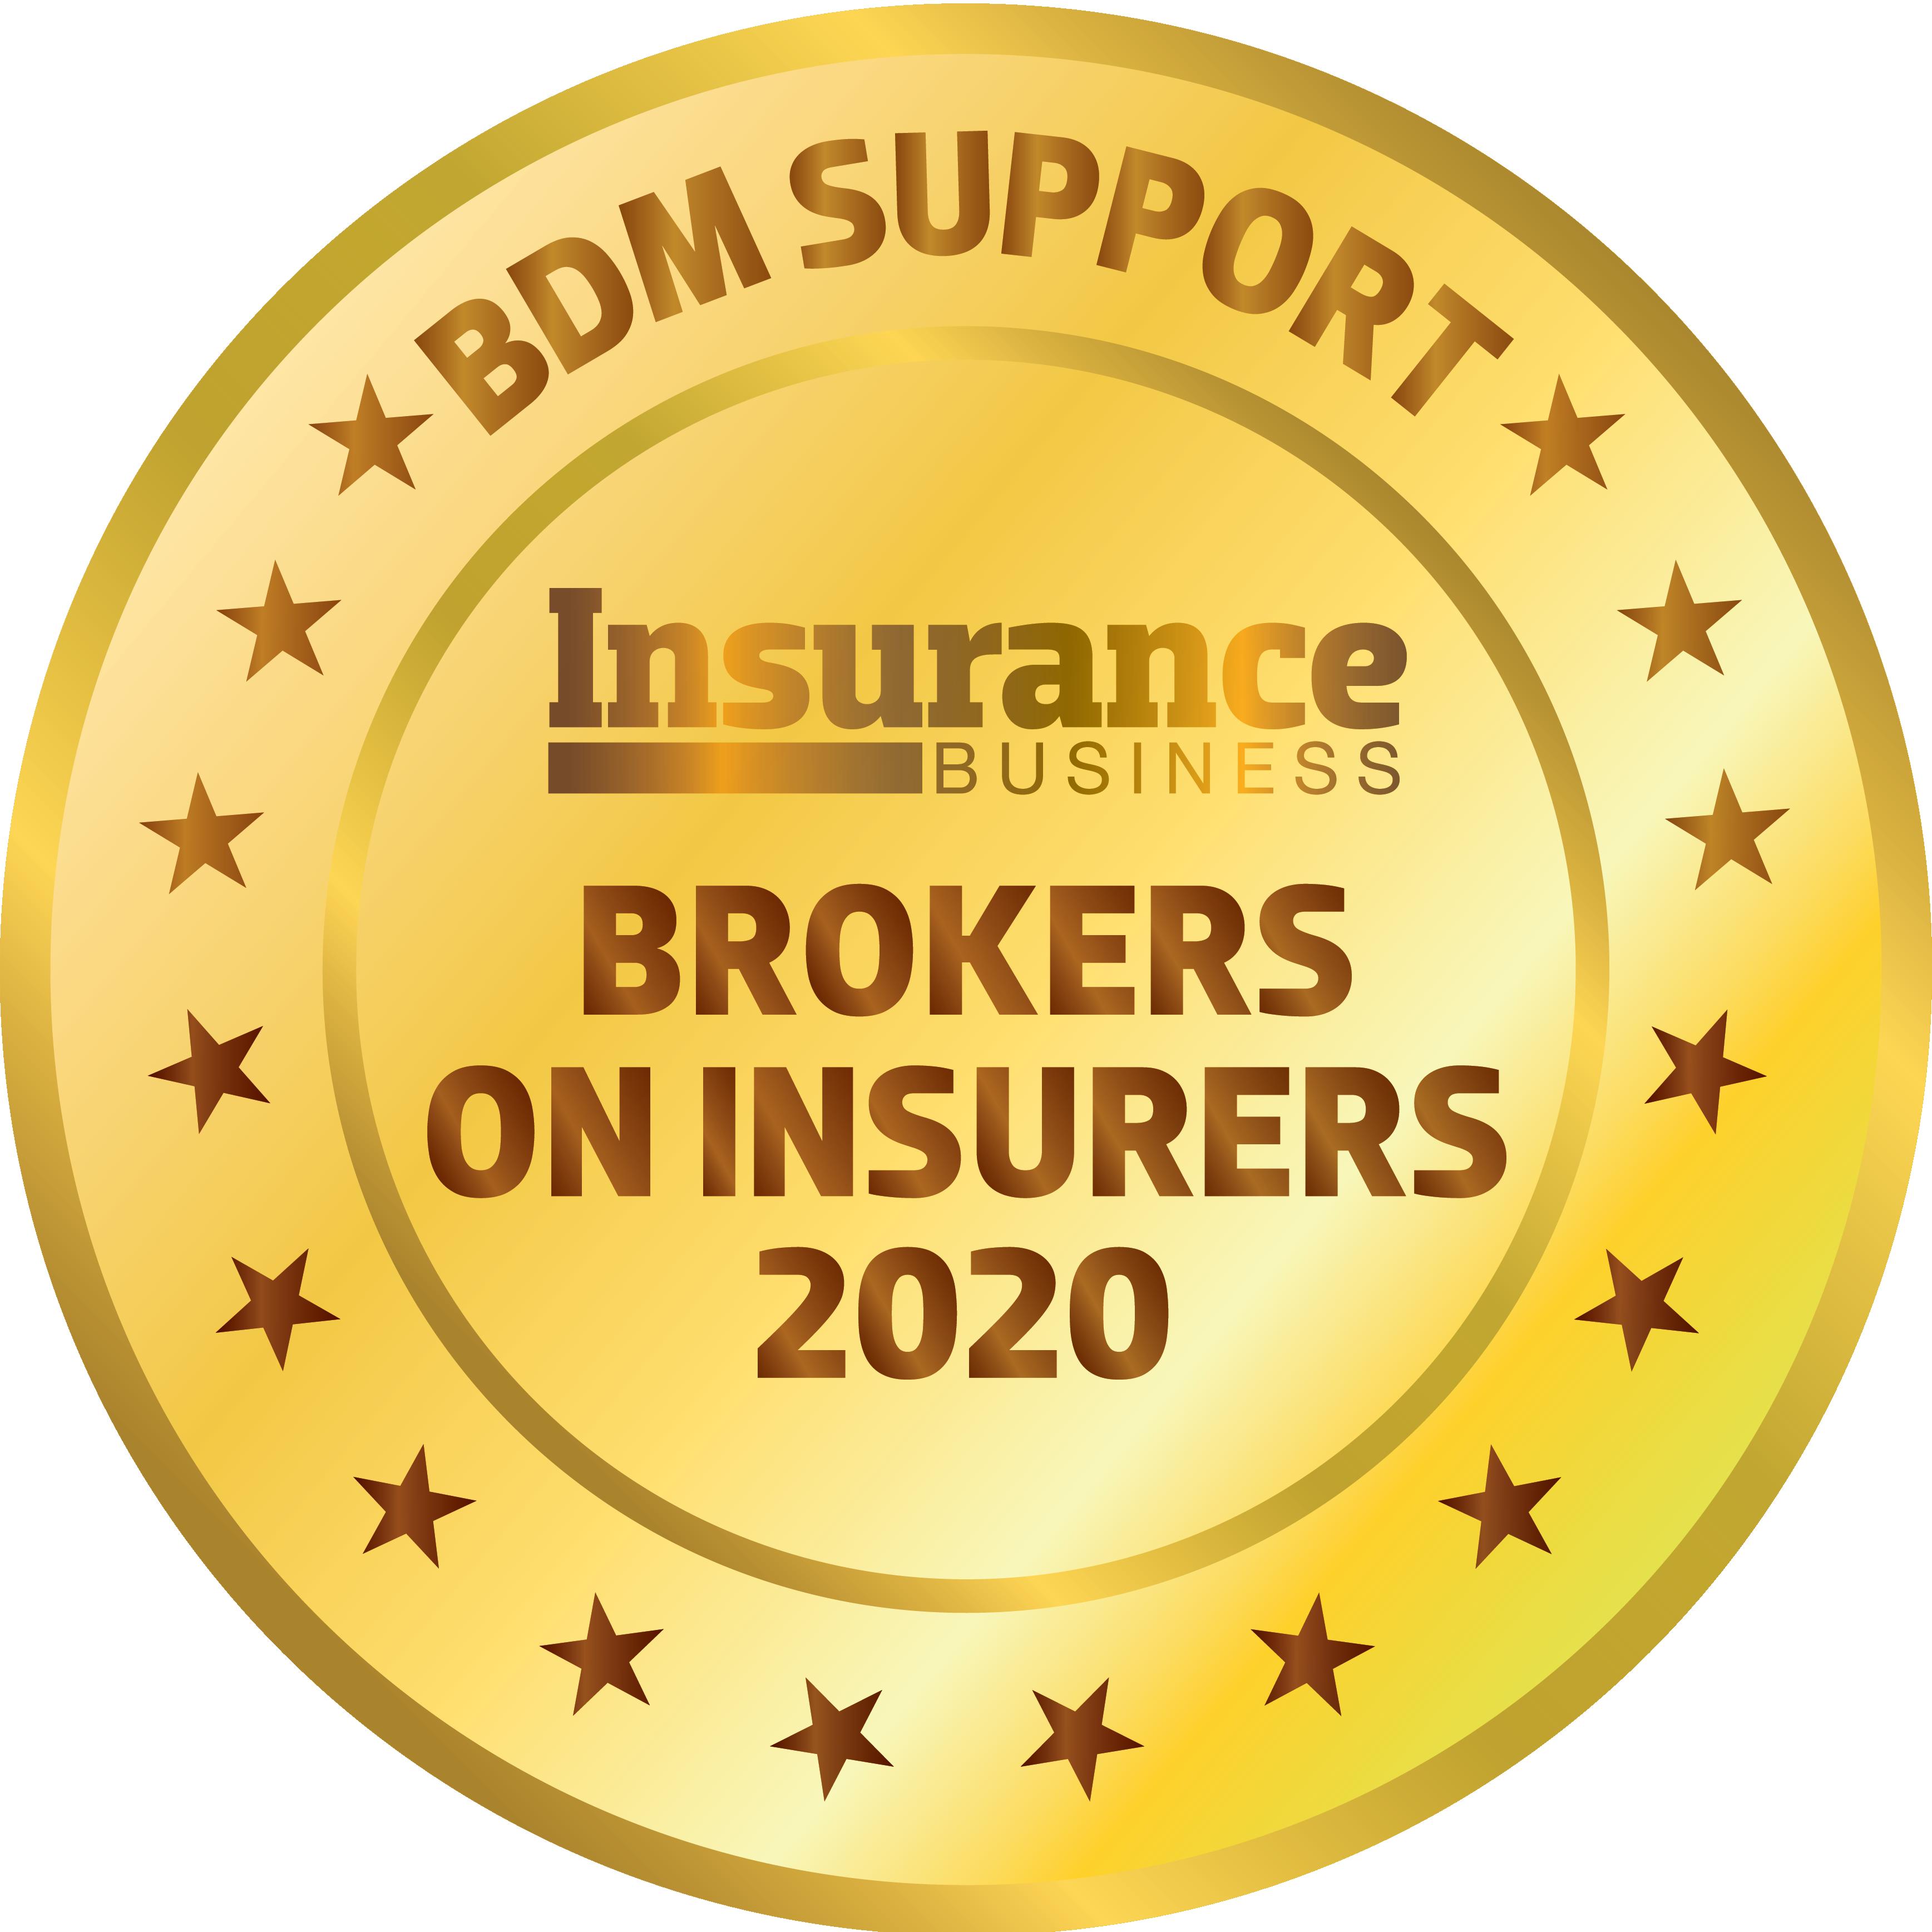 BDM support